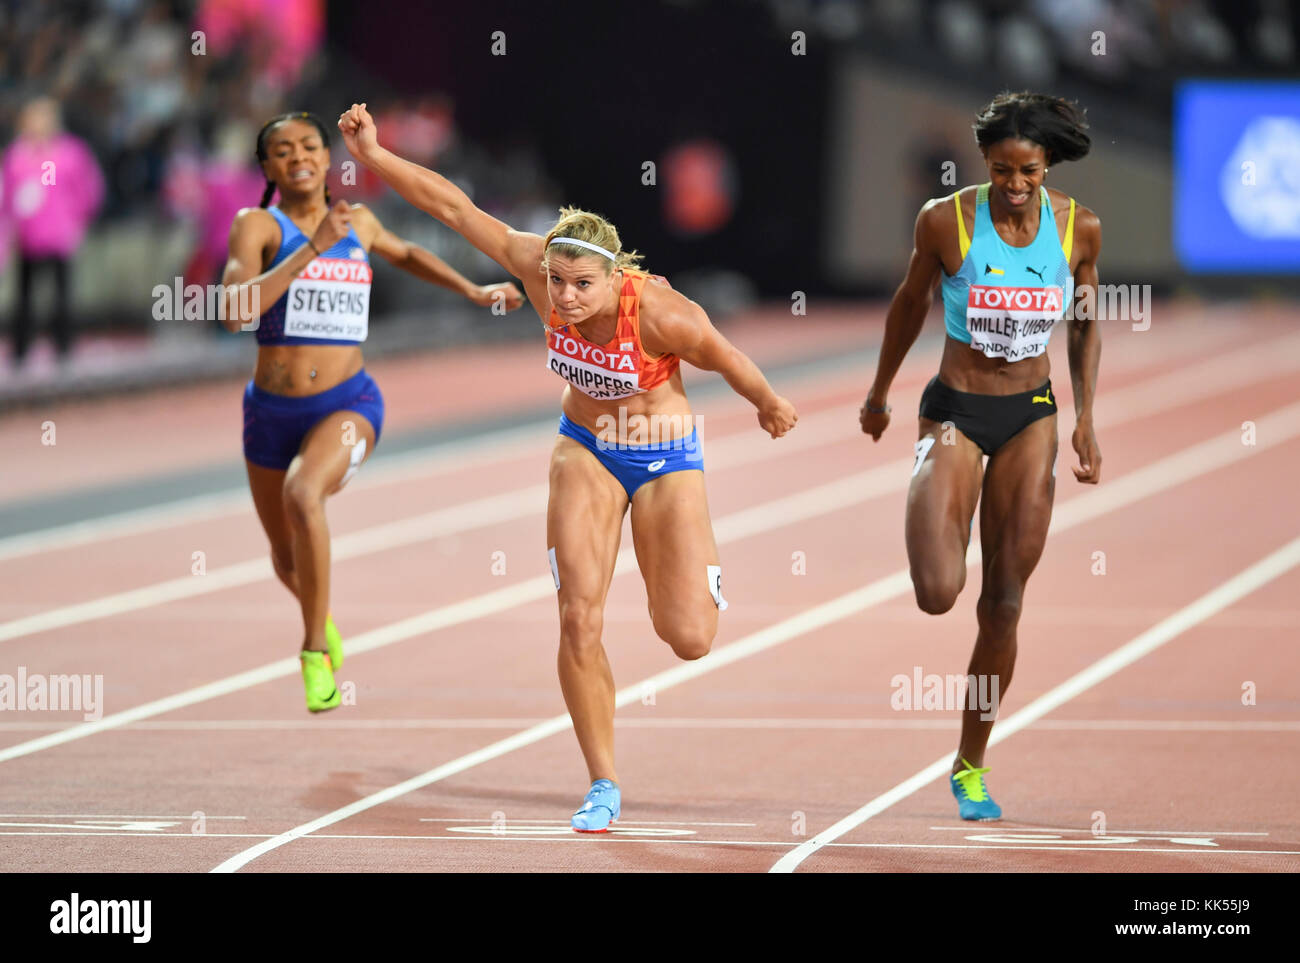 Dafne Schippers - 200 m Frauen Goldmedaille - IAAF World Championships in London 2017 Stockbild